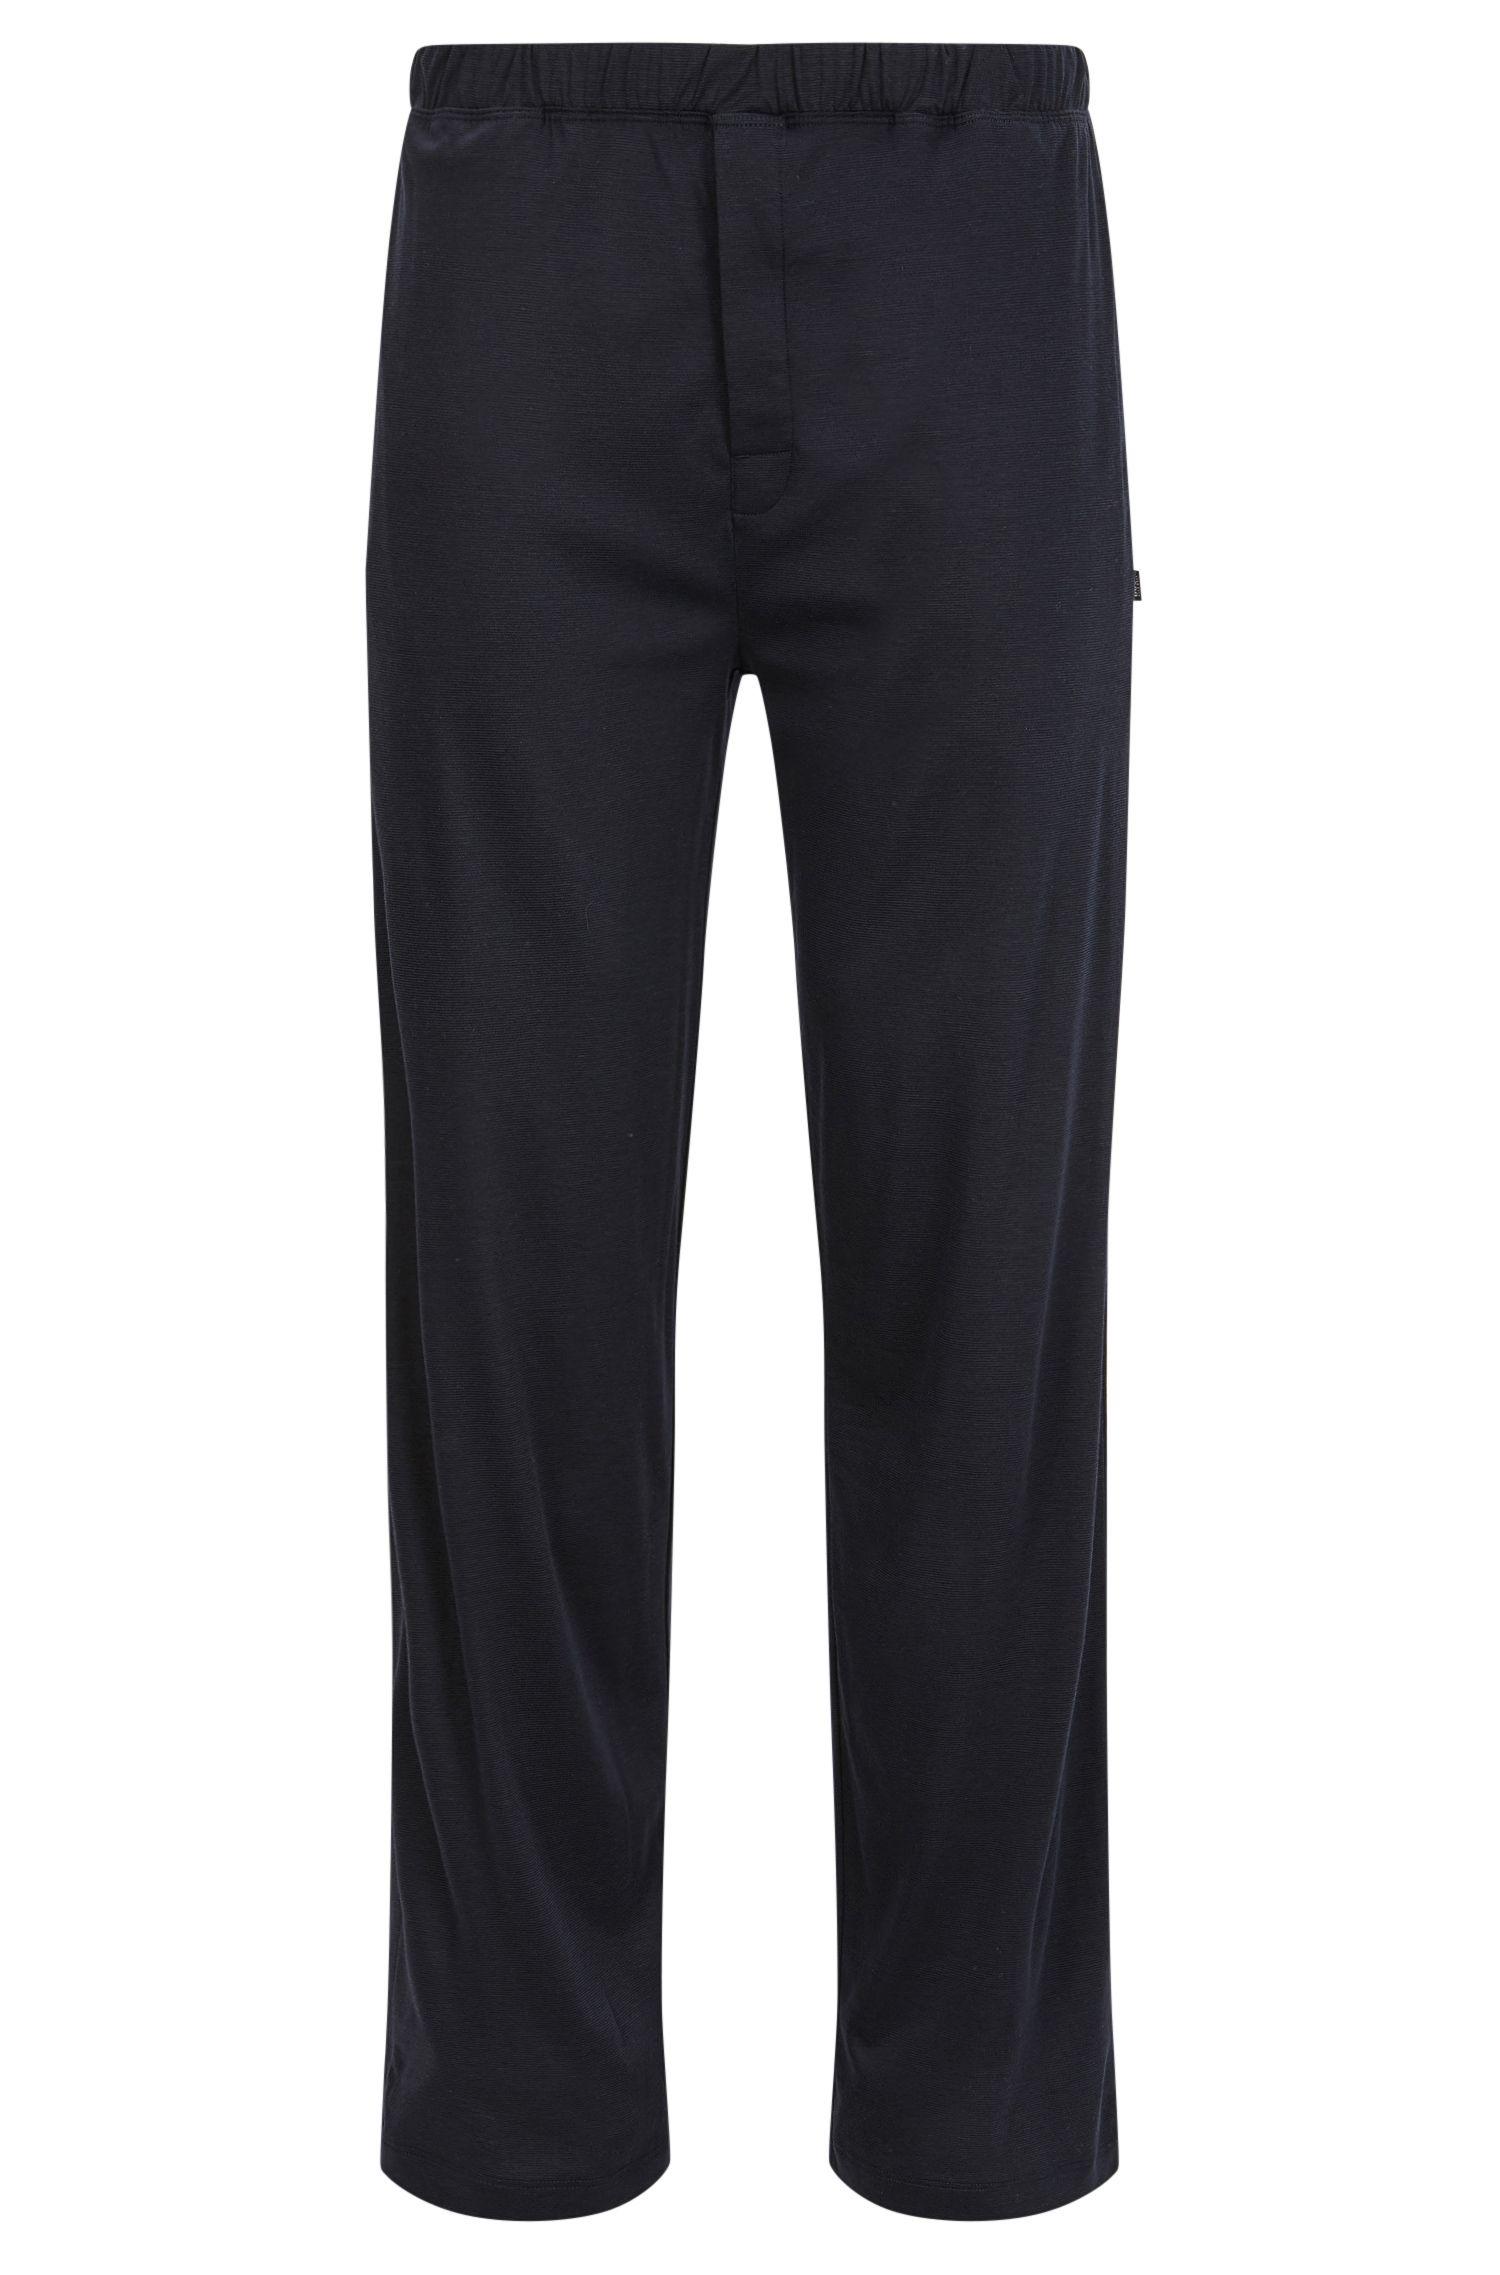 Pyjama bottoms in cotton-modal single jersey